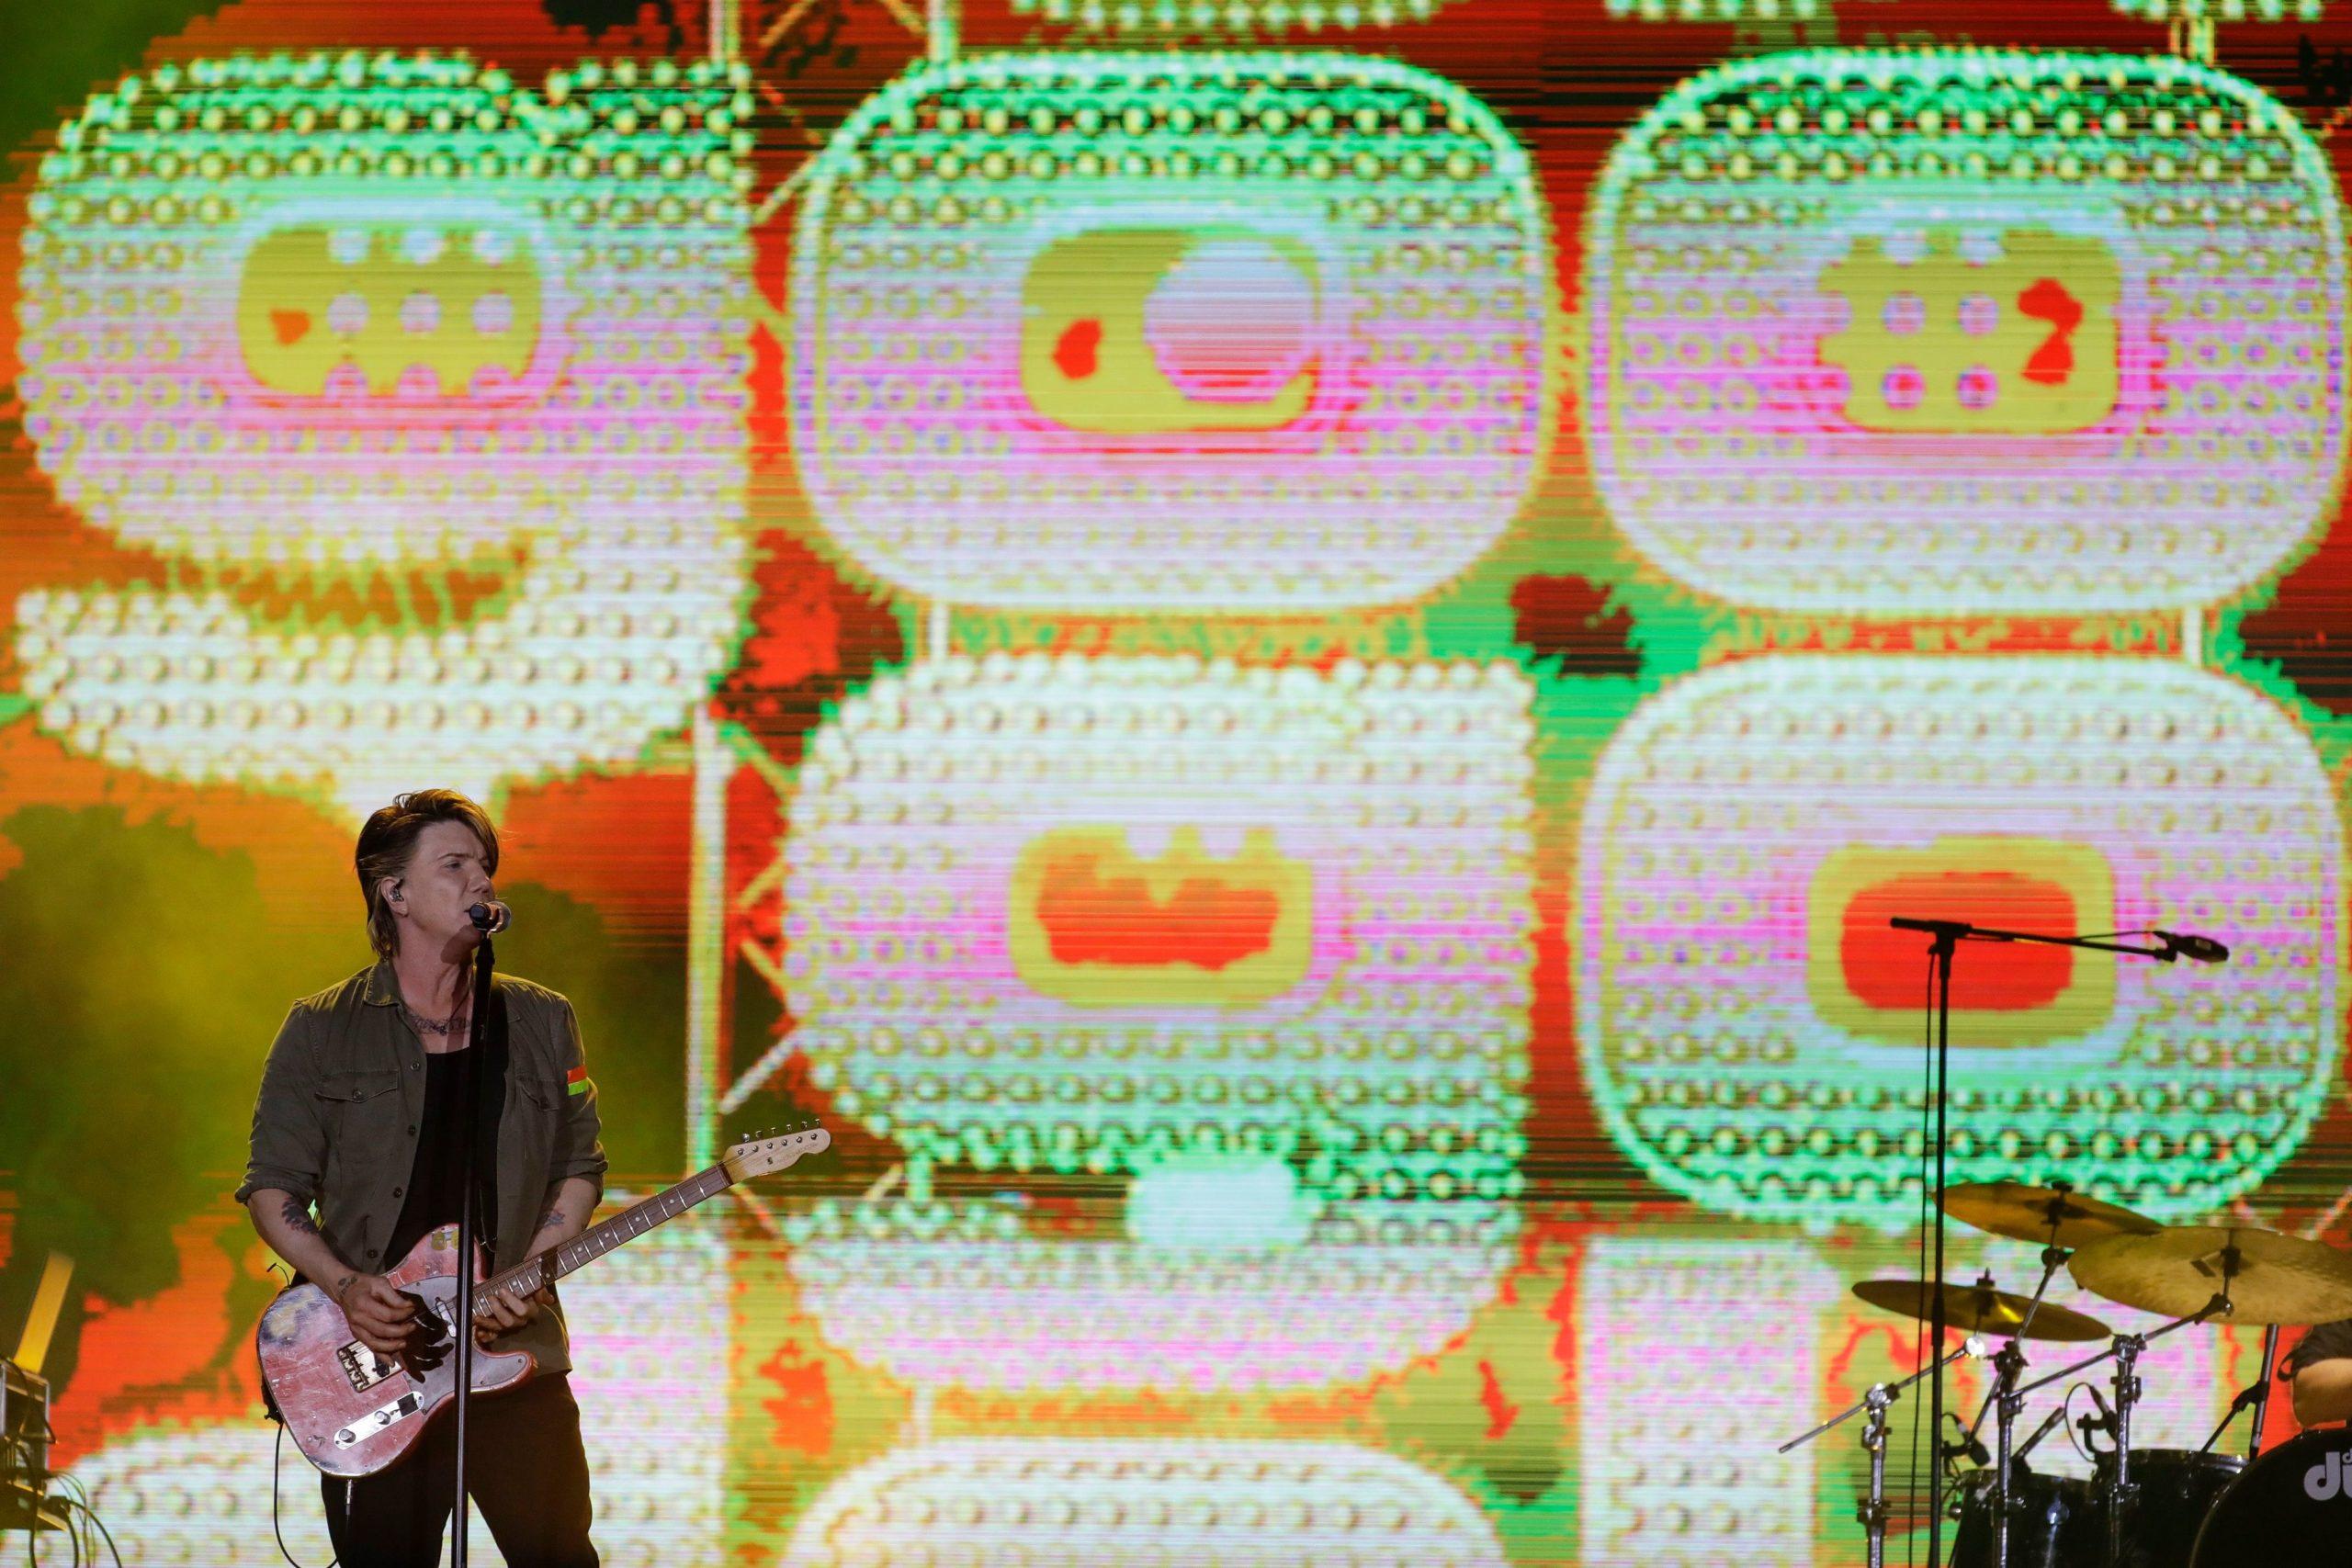 John Rzeznik of the Goo Goo Dolls performs at the Rock in Rio music festival